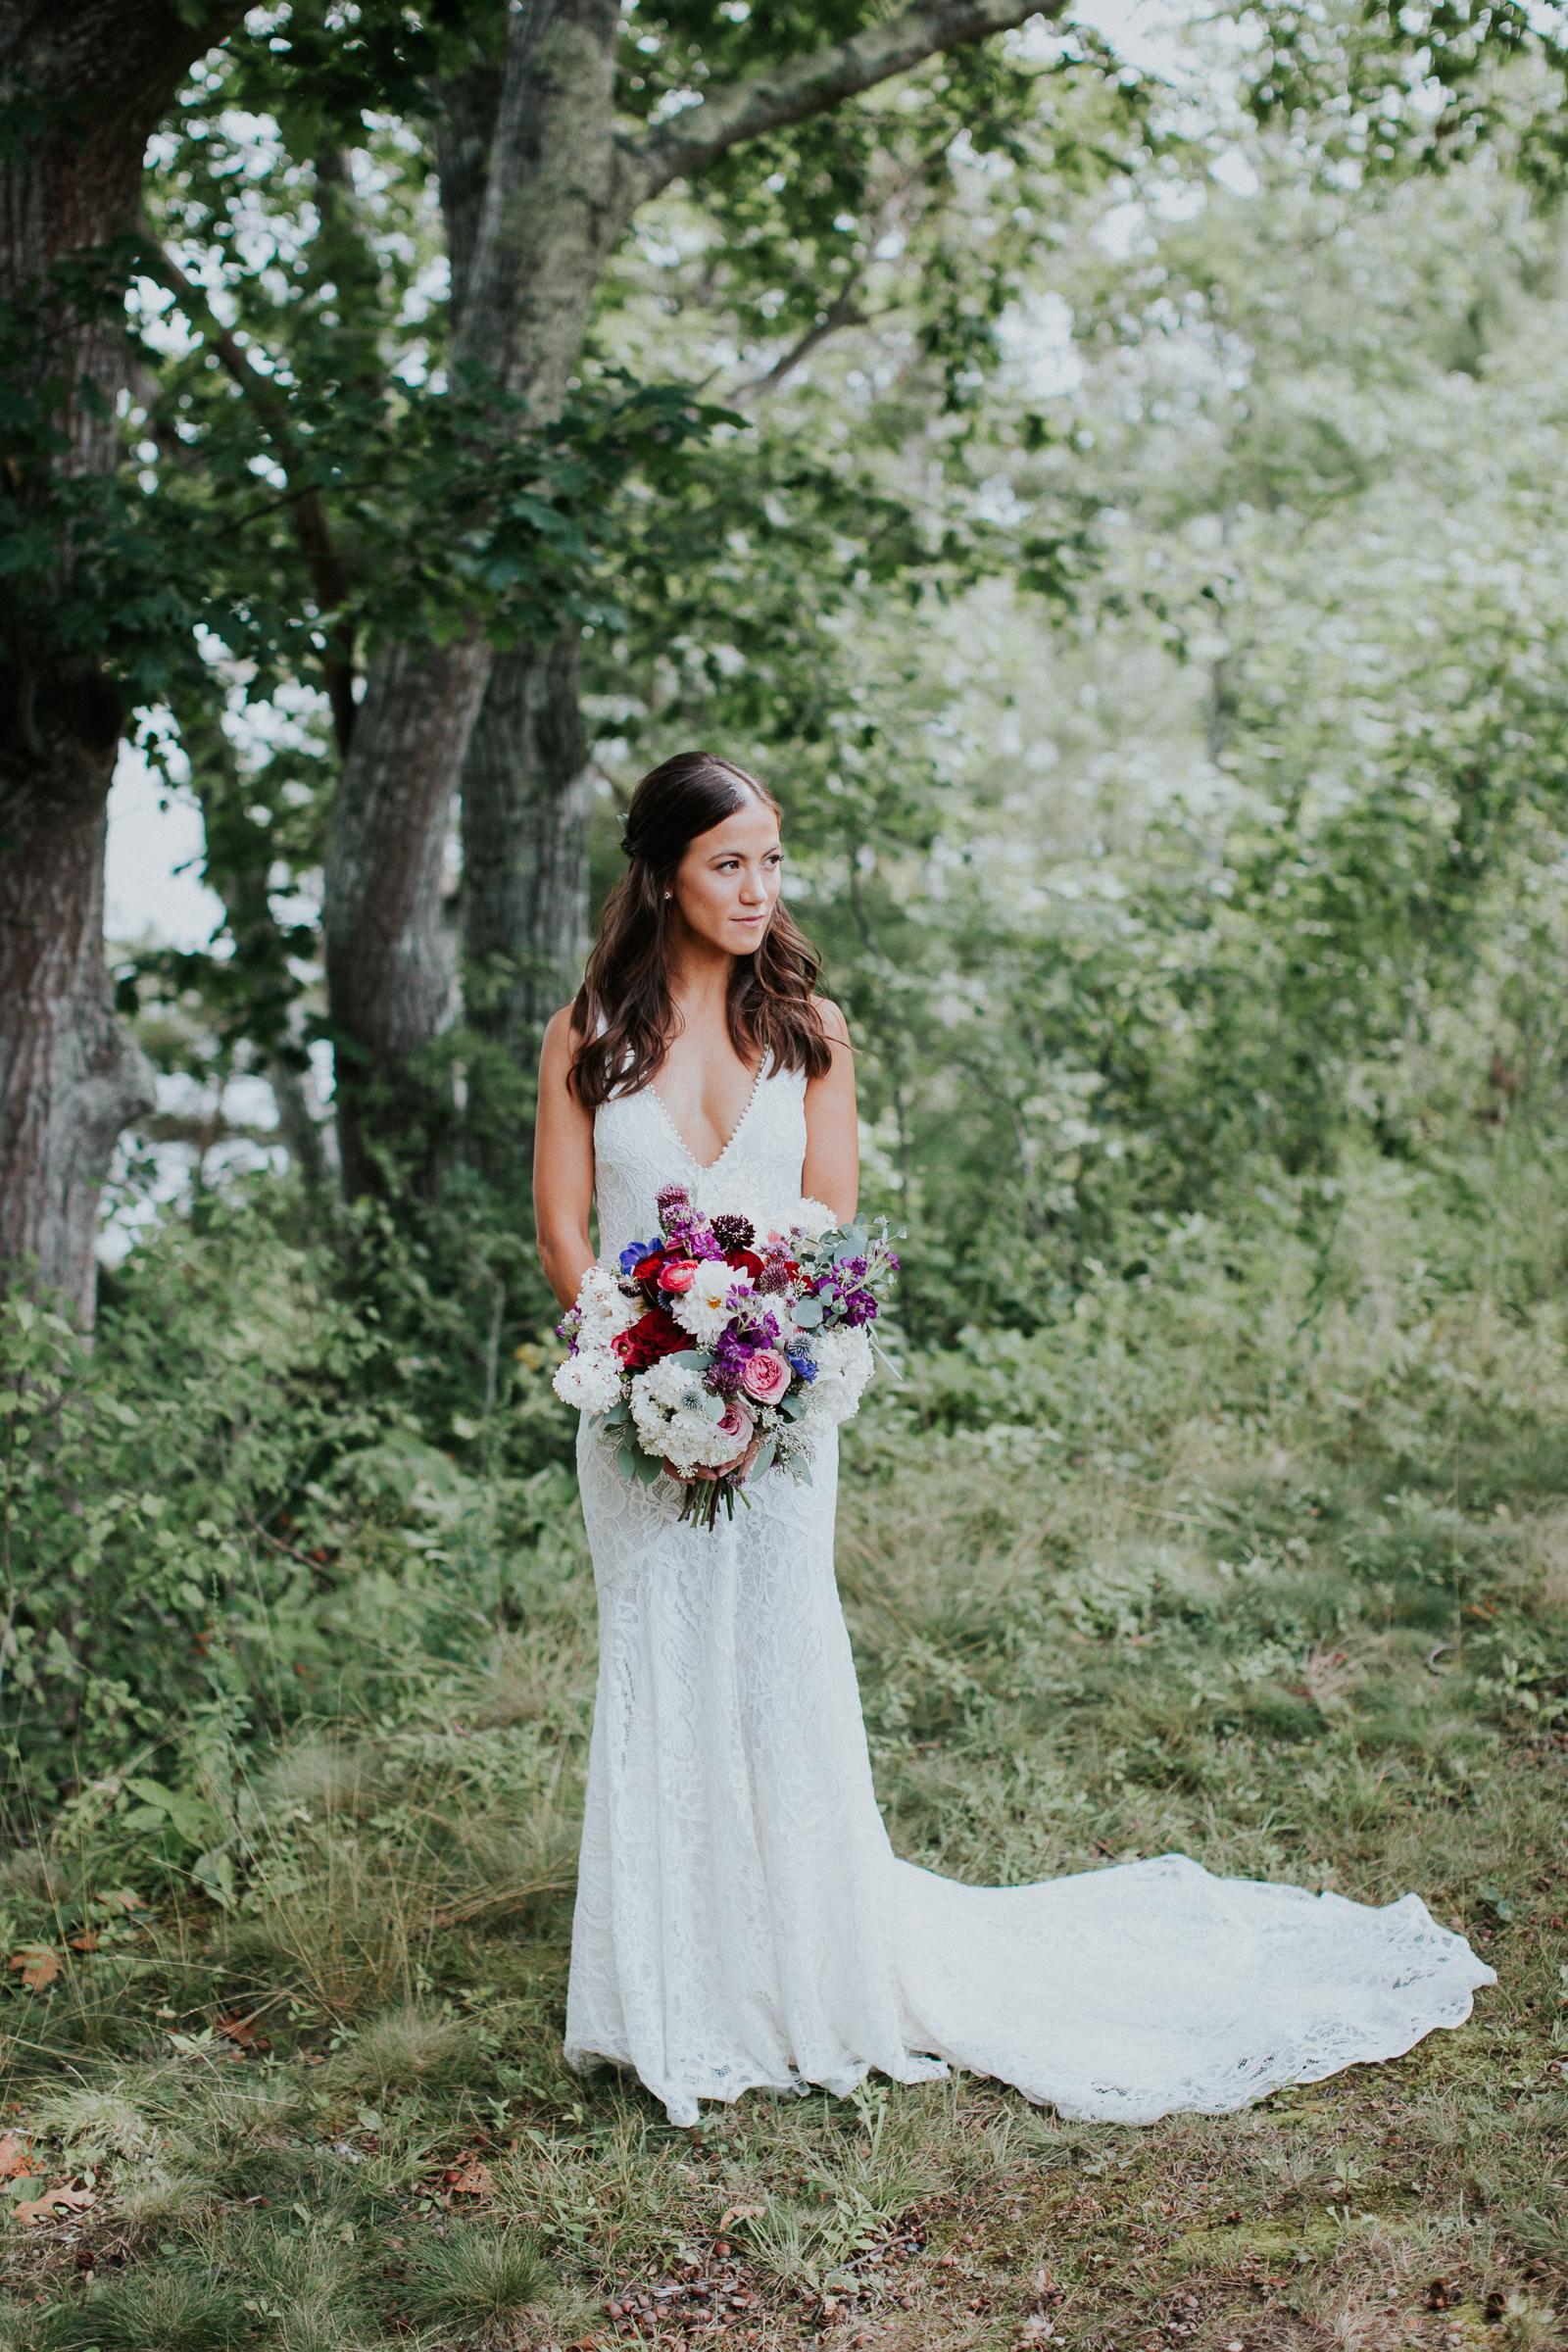 Marianmade-Farm-Wiscasset-Maine-Fine-Art-Documentary-Wedding-Photographer-Elvira-Kalviste-Photography-48.jpg